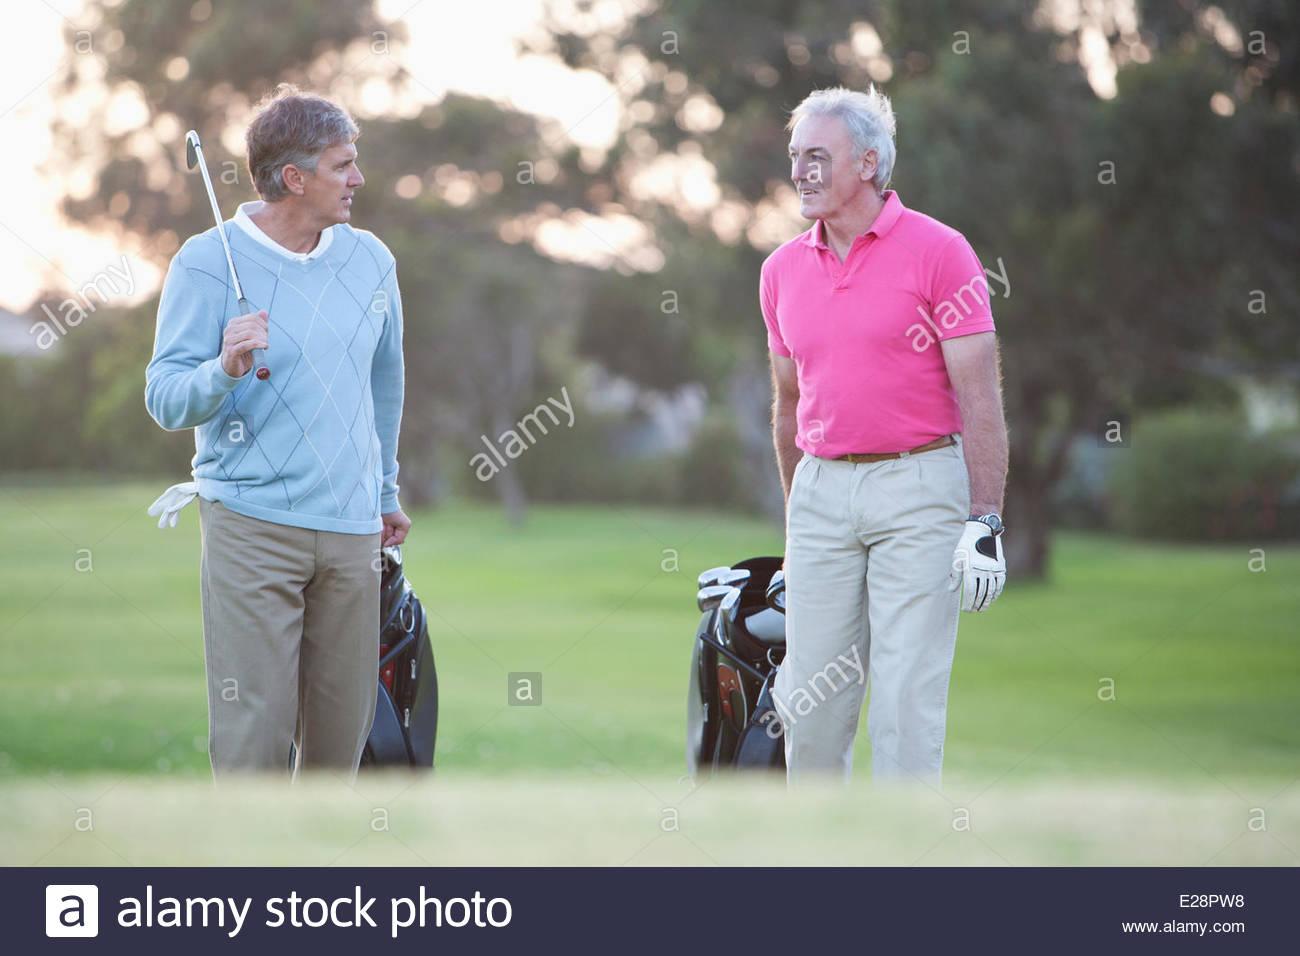 Los hombres tirando de carritos de golf Imagen De Stock